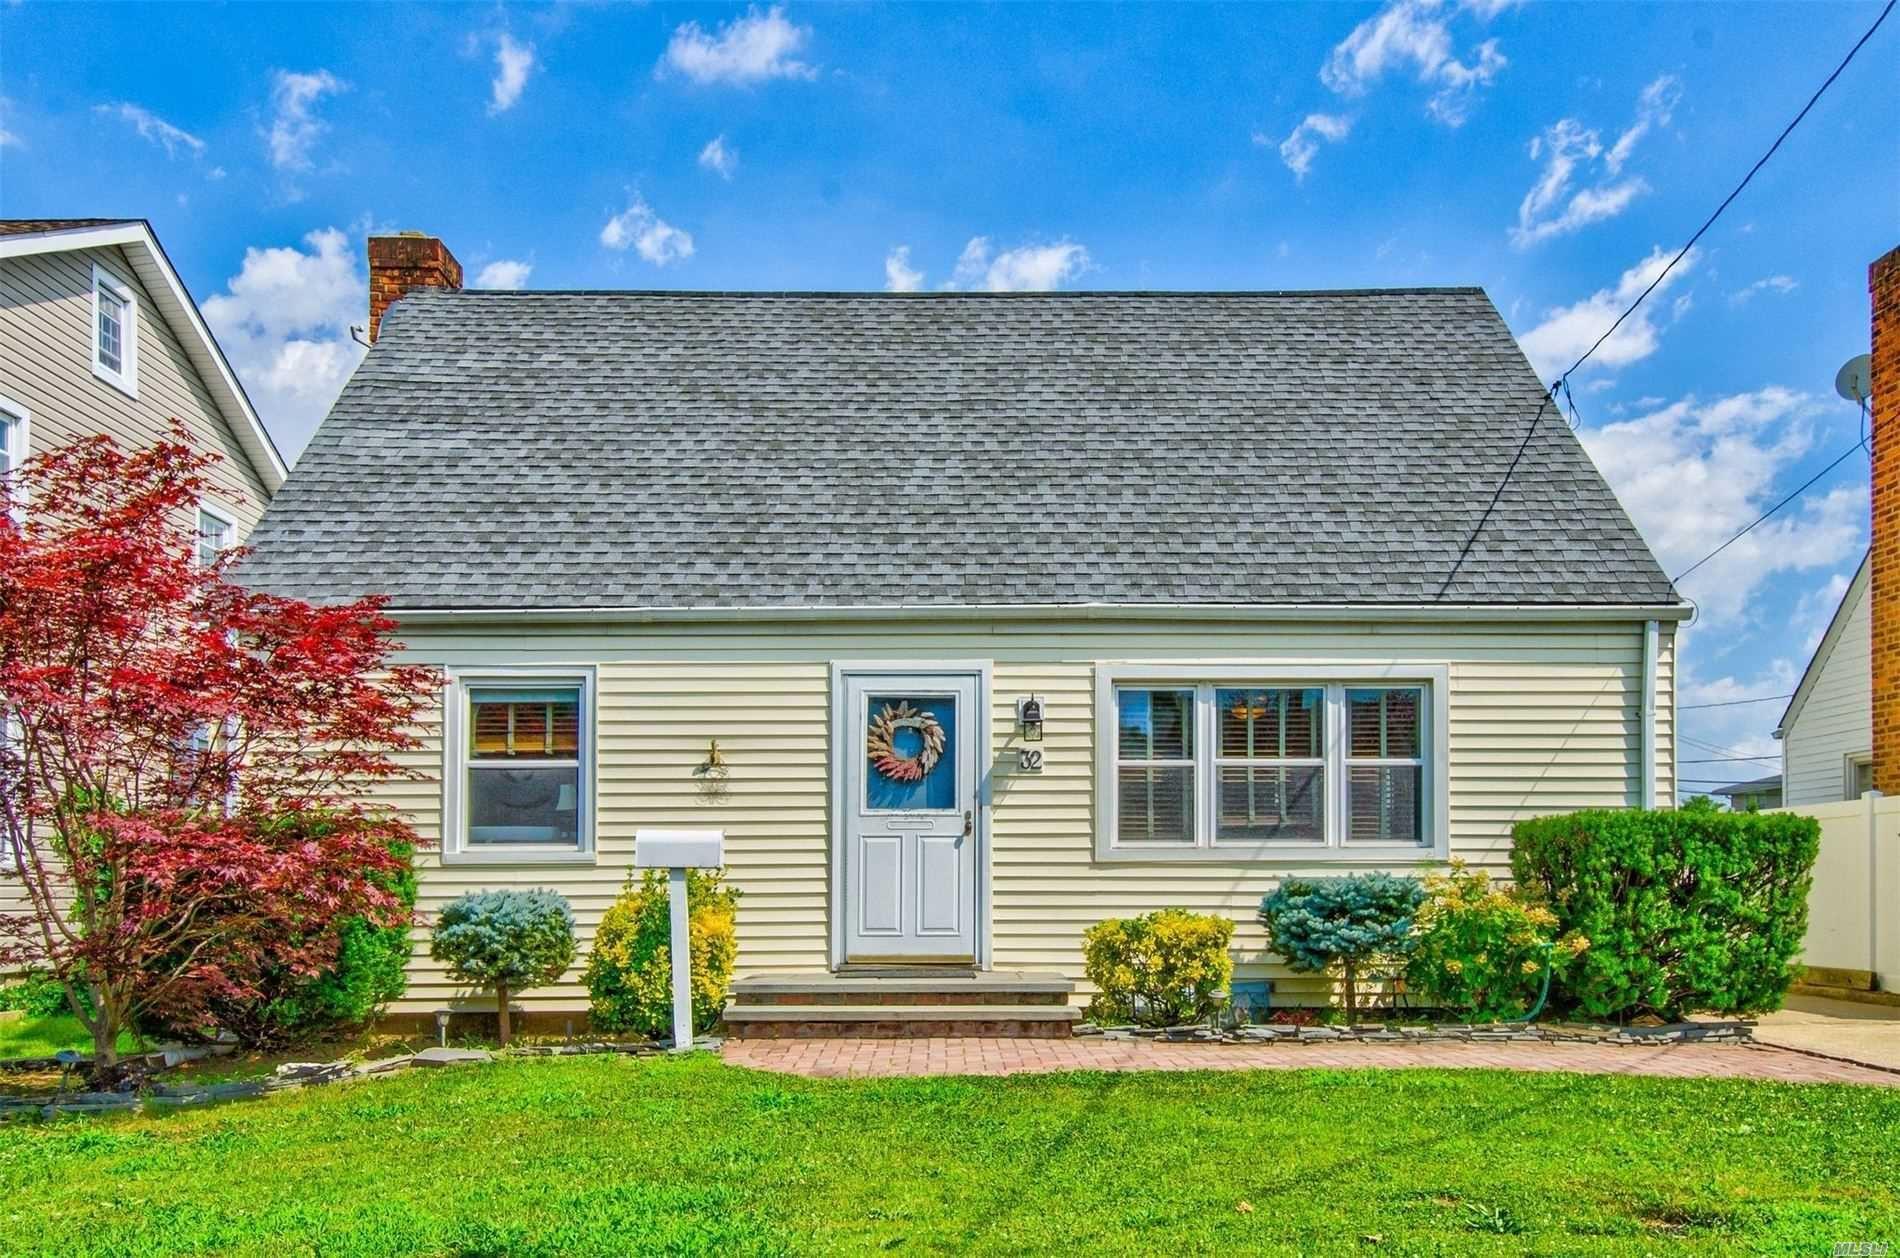 32 Terrace Place, Hicksville, NY 11801 - MLS#: 3240124